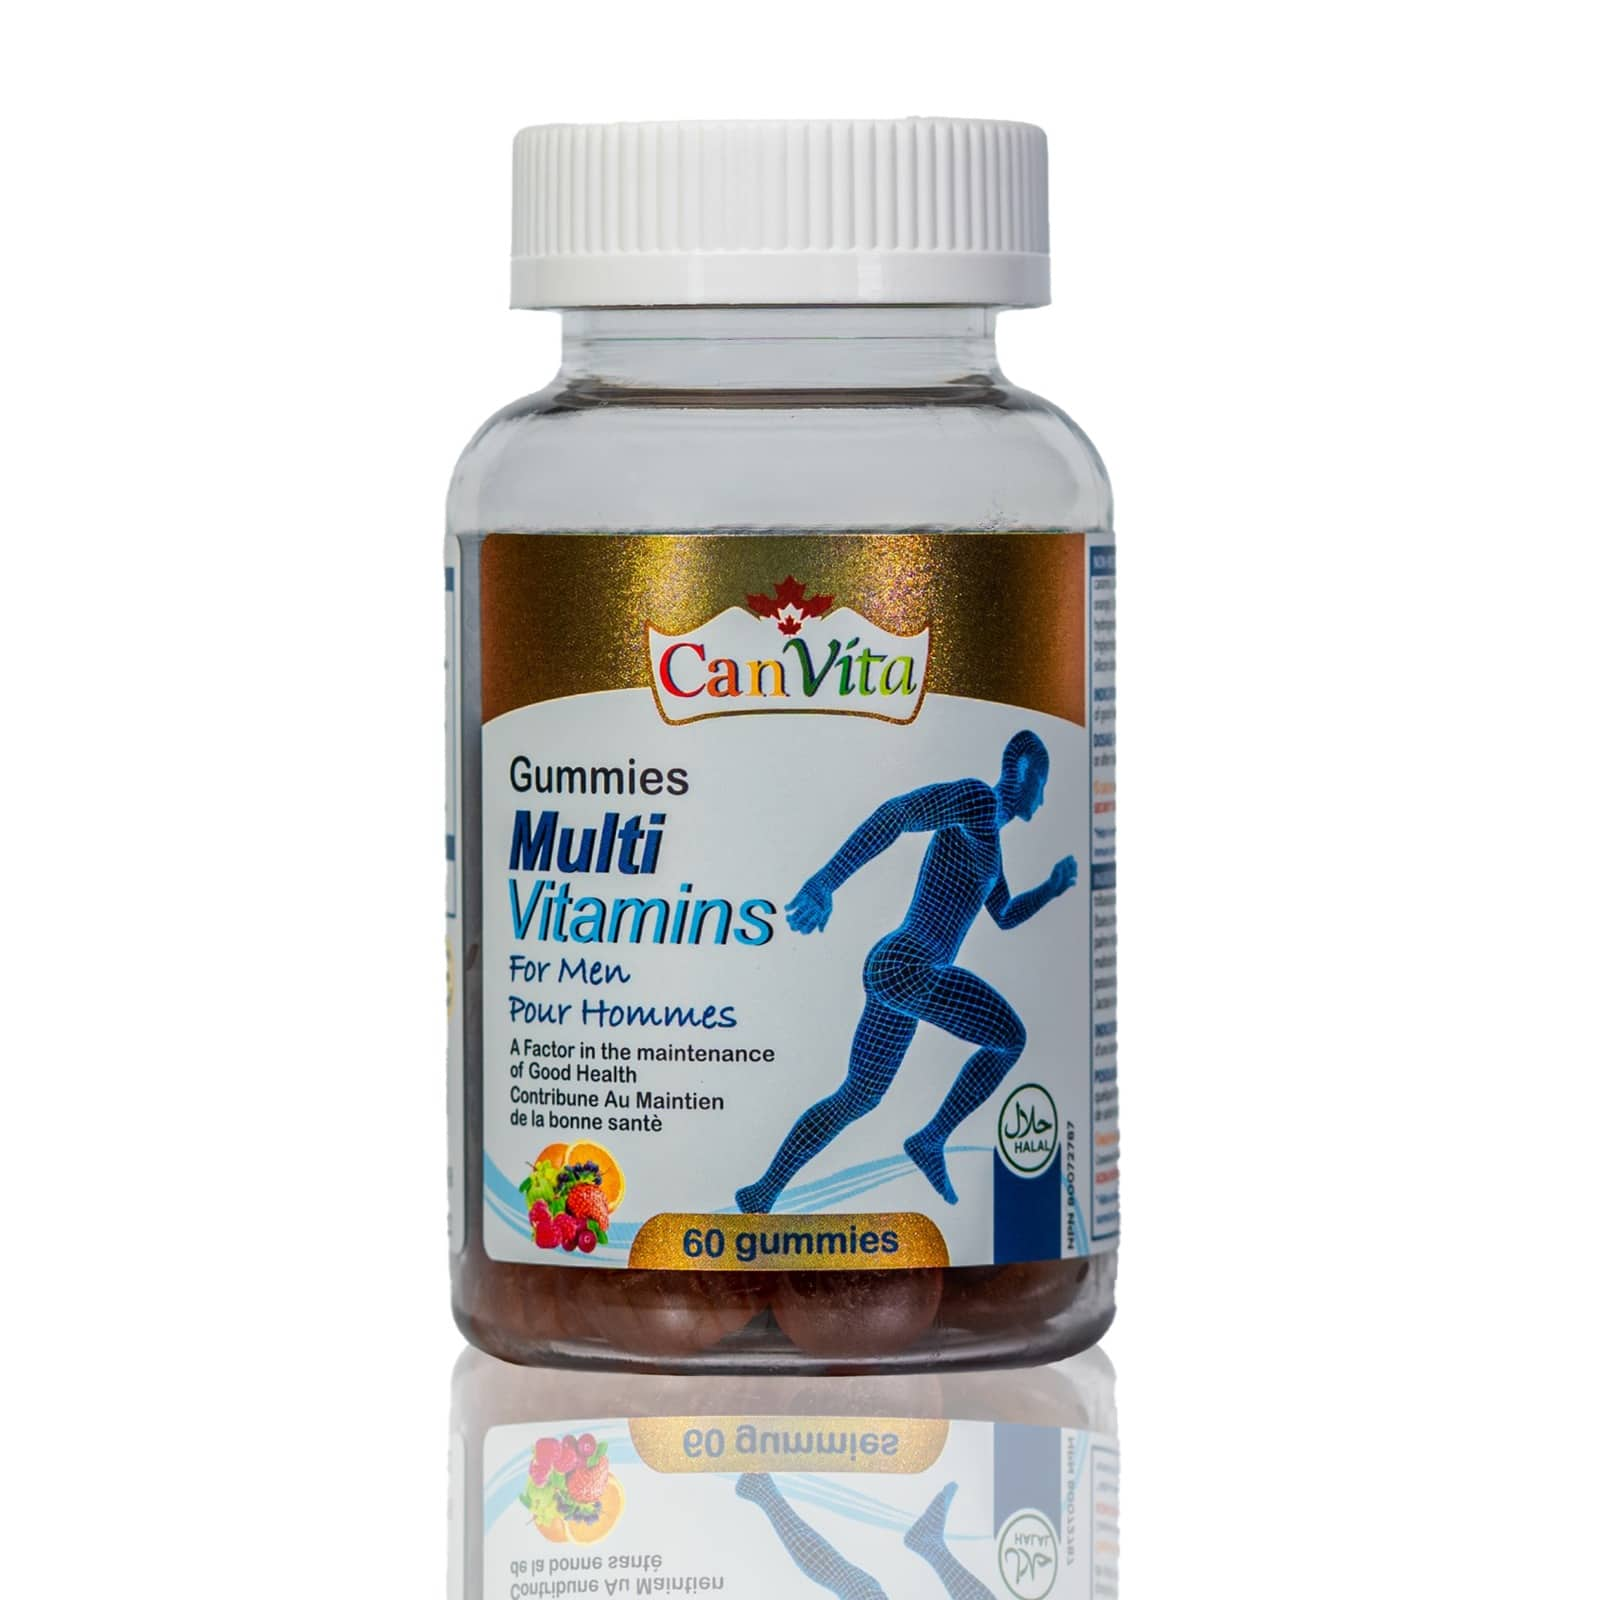 Canvita Men's multivitamin gummy